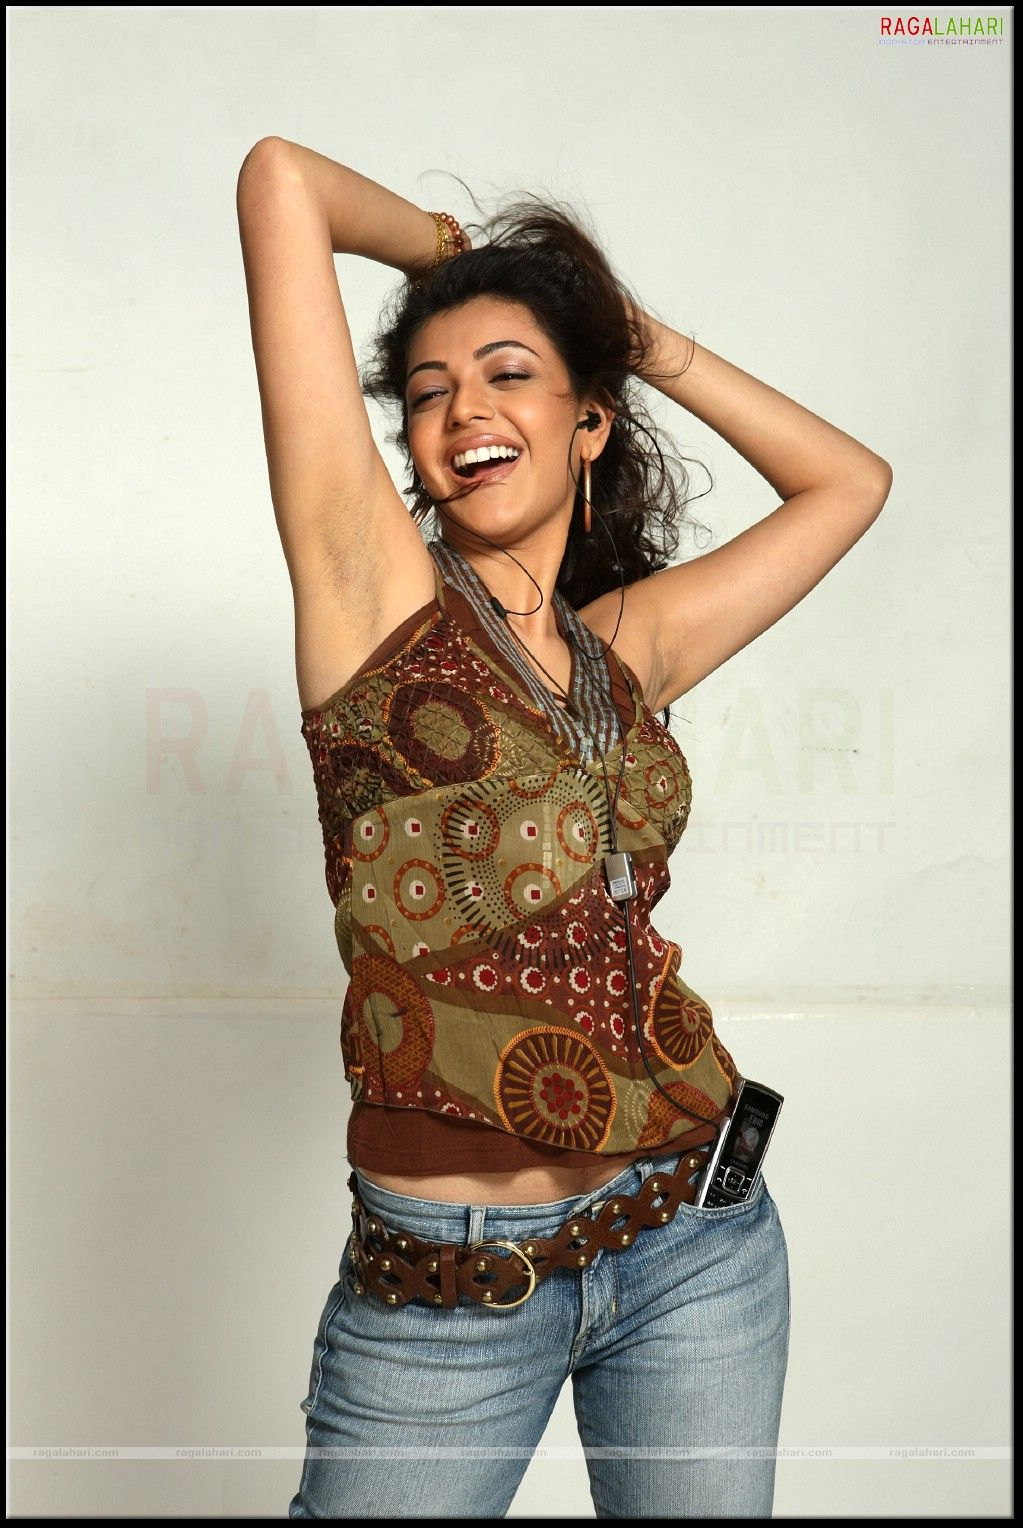 kajal agarwal rough armpit - photo #12